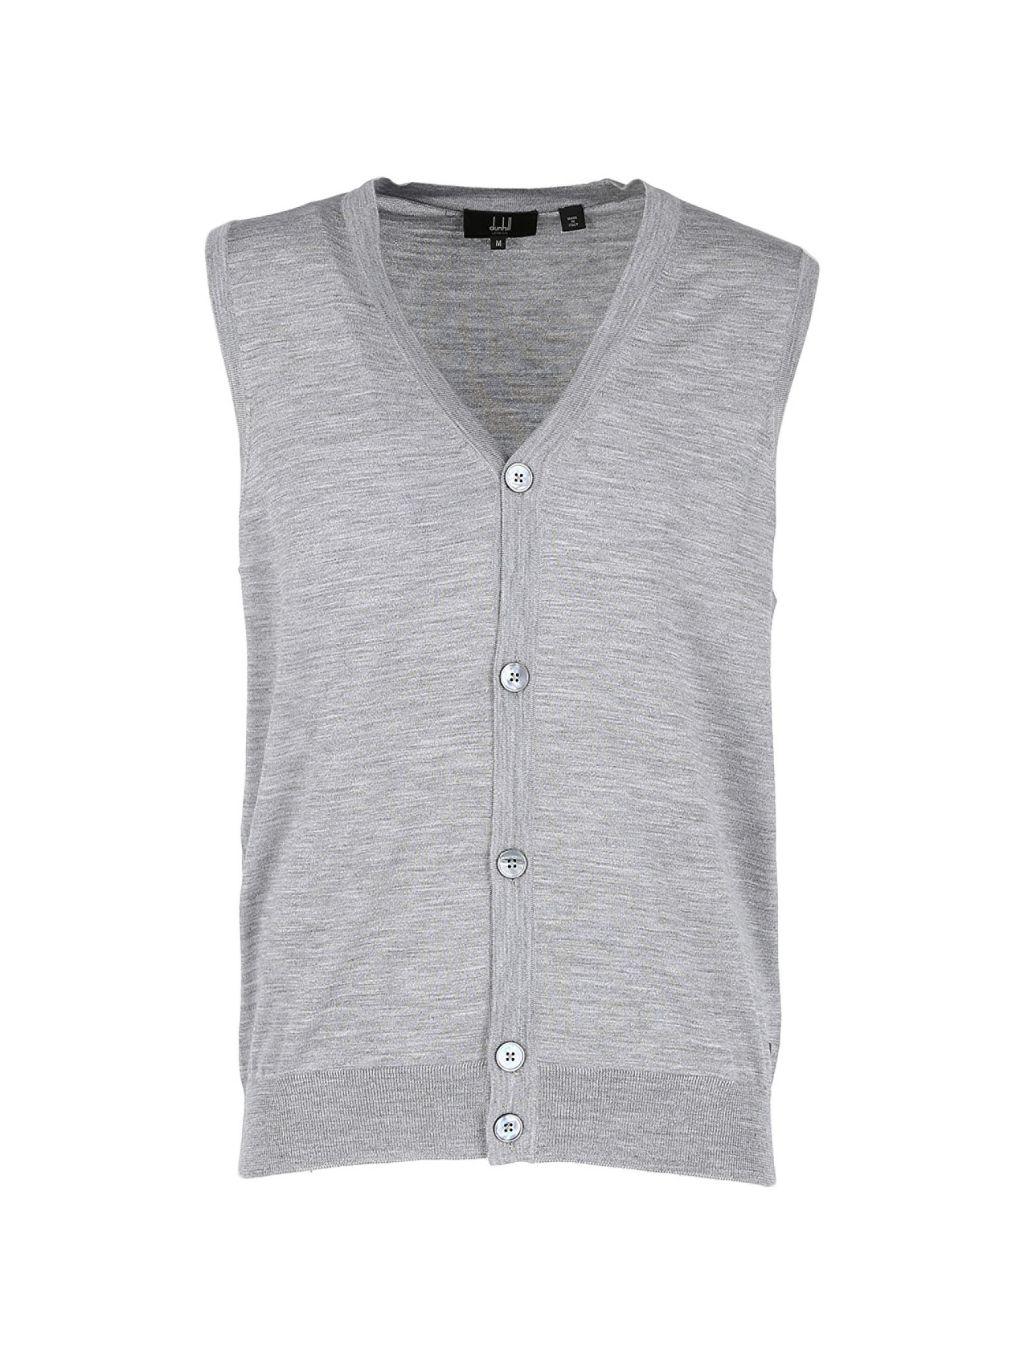 Dunhill Fine Gauge Merino Wool Sweater Vest